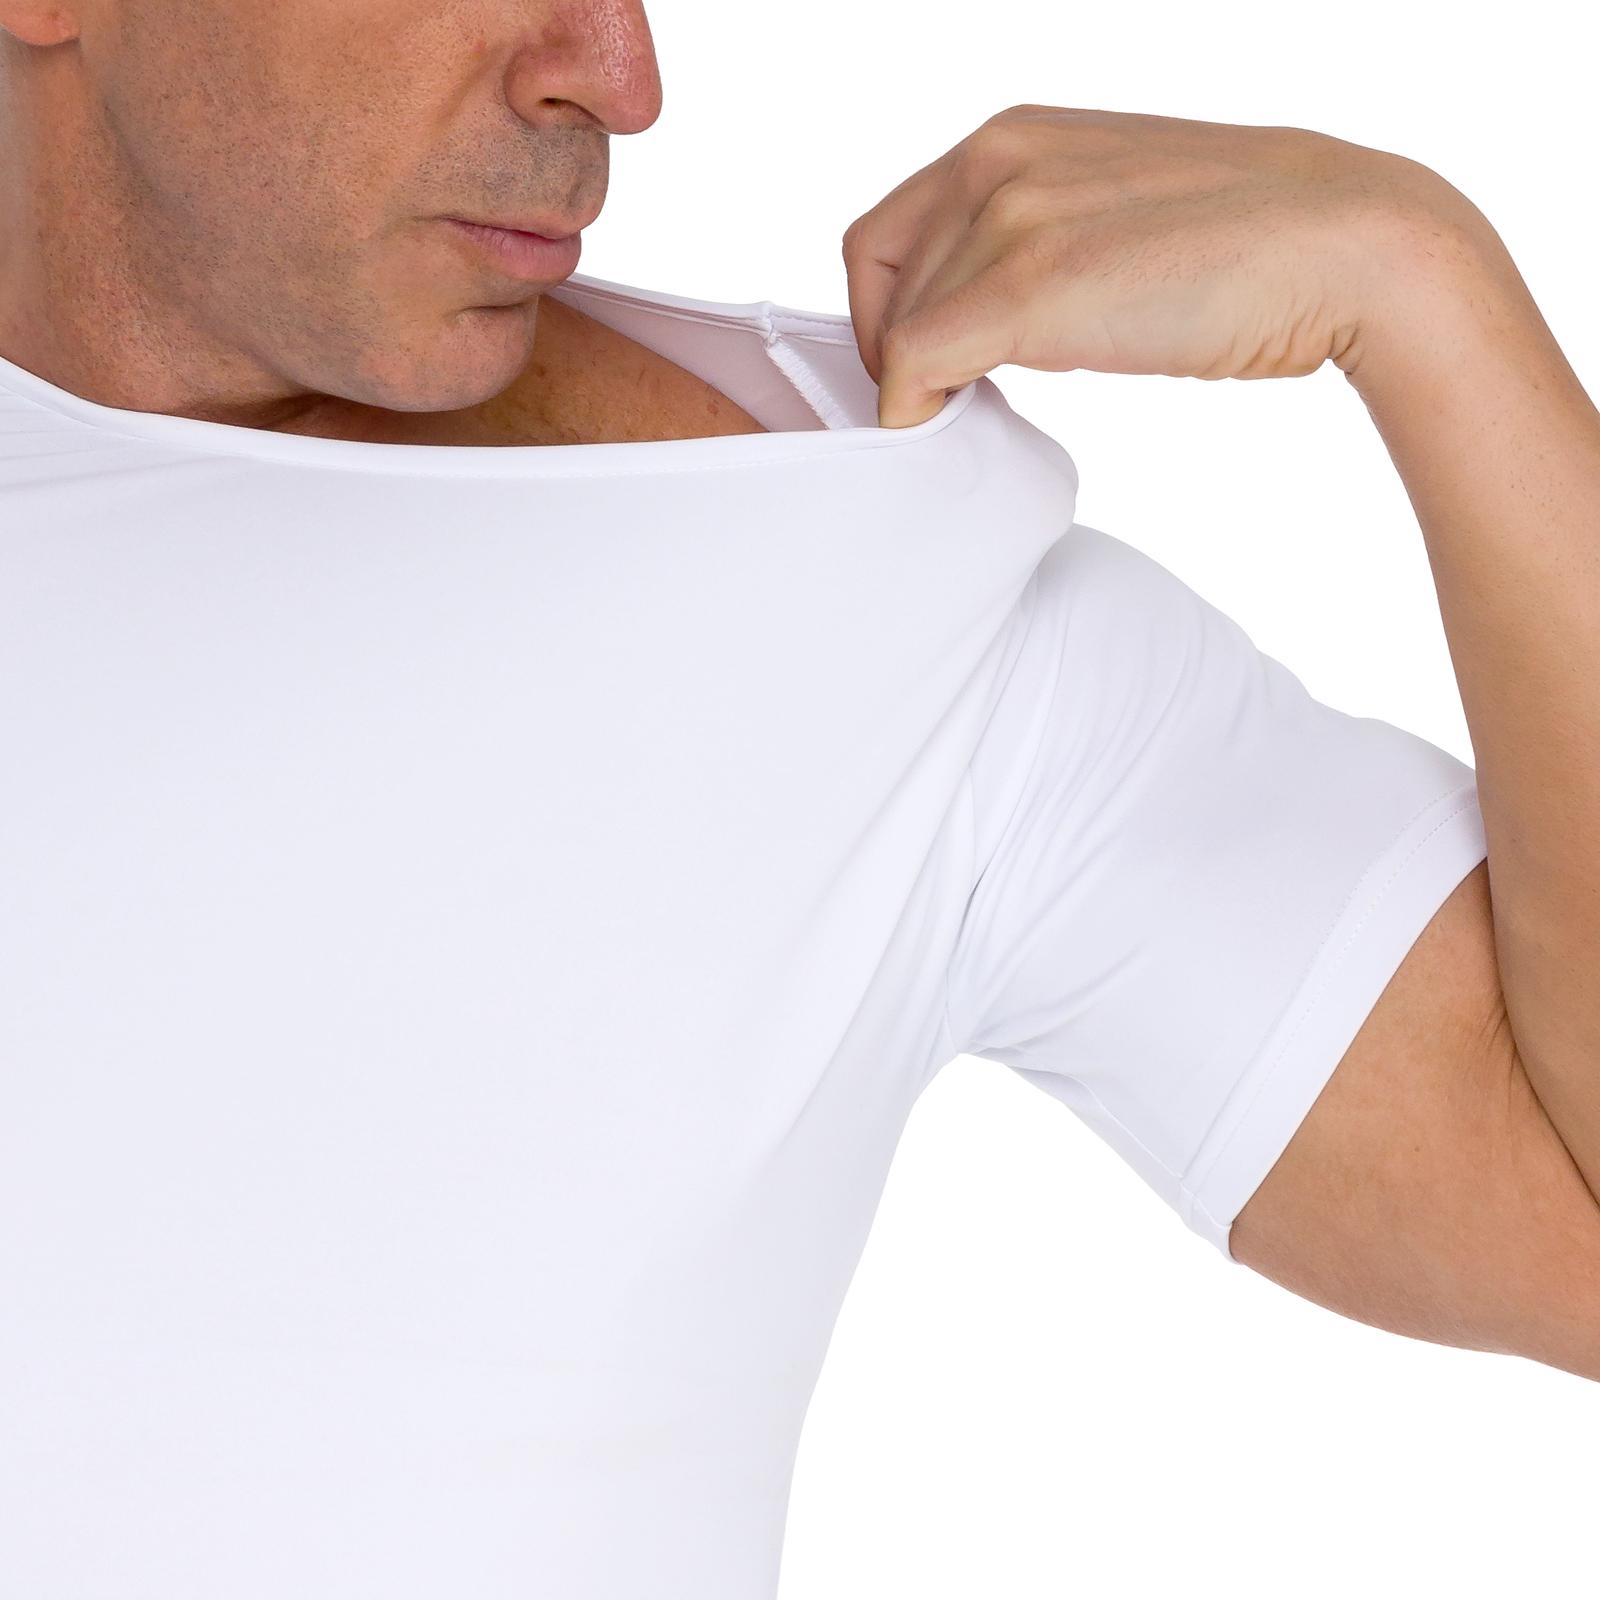 LISH-Men-039-s-Slimming-Compression-Body-Shaper-Gynecomastia-Undershirt thumbnail 25